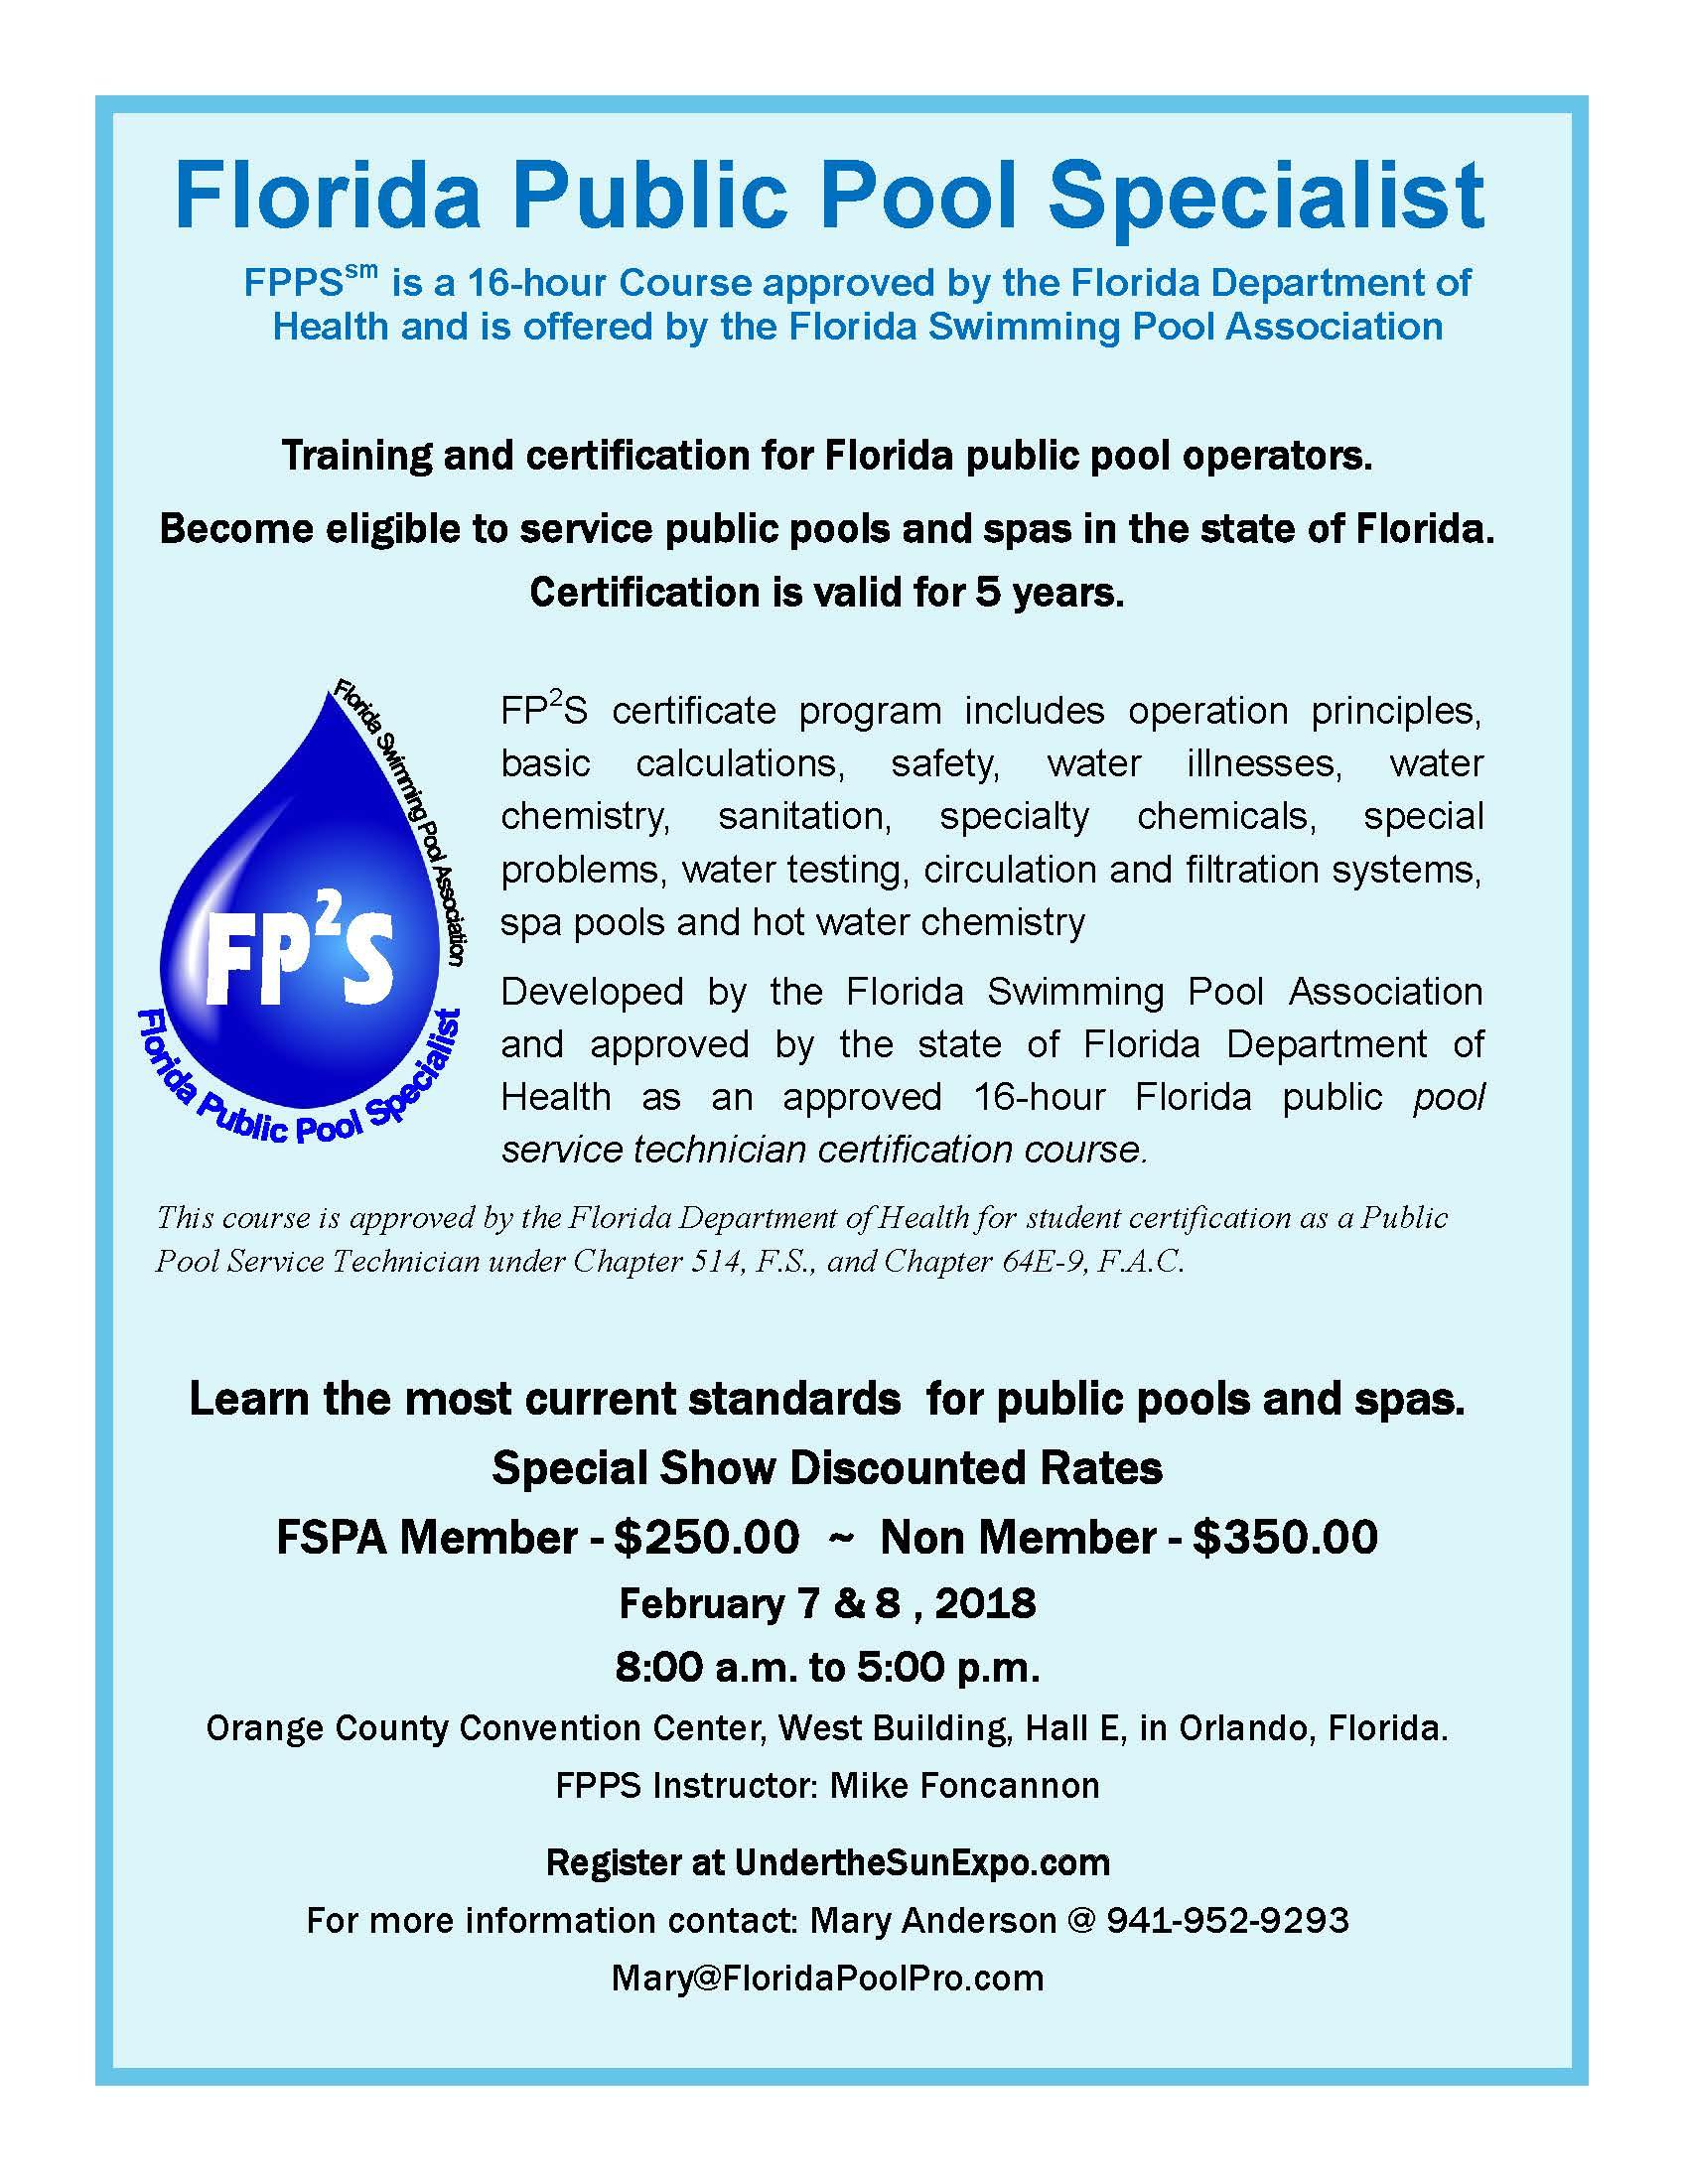 Florida public pool specialist course fspa florida public pool specialist course 1betcityfo Images